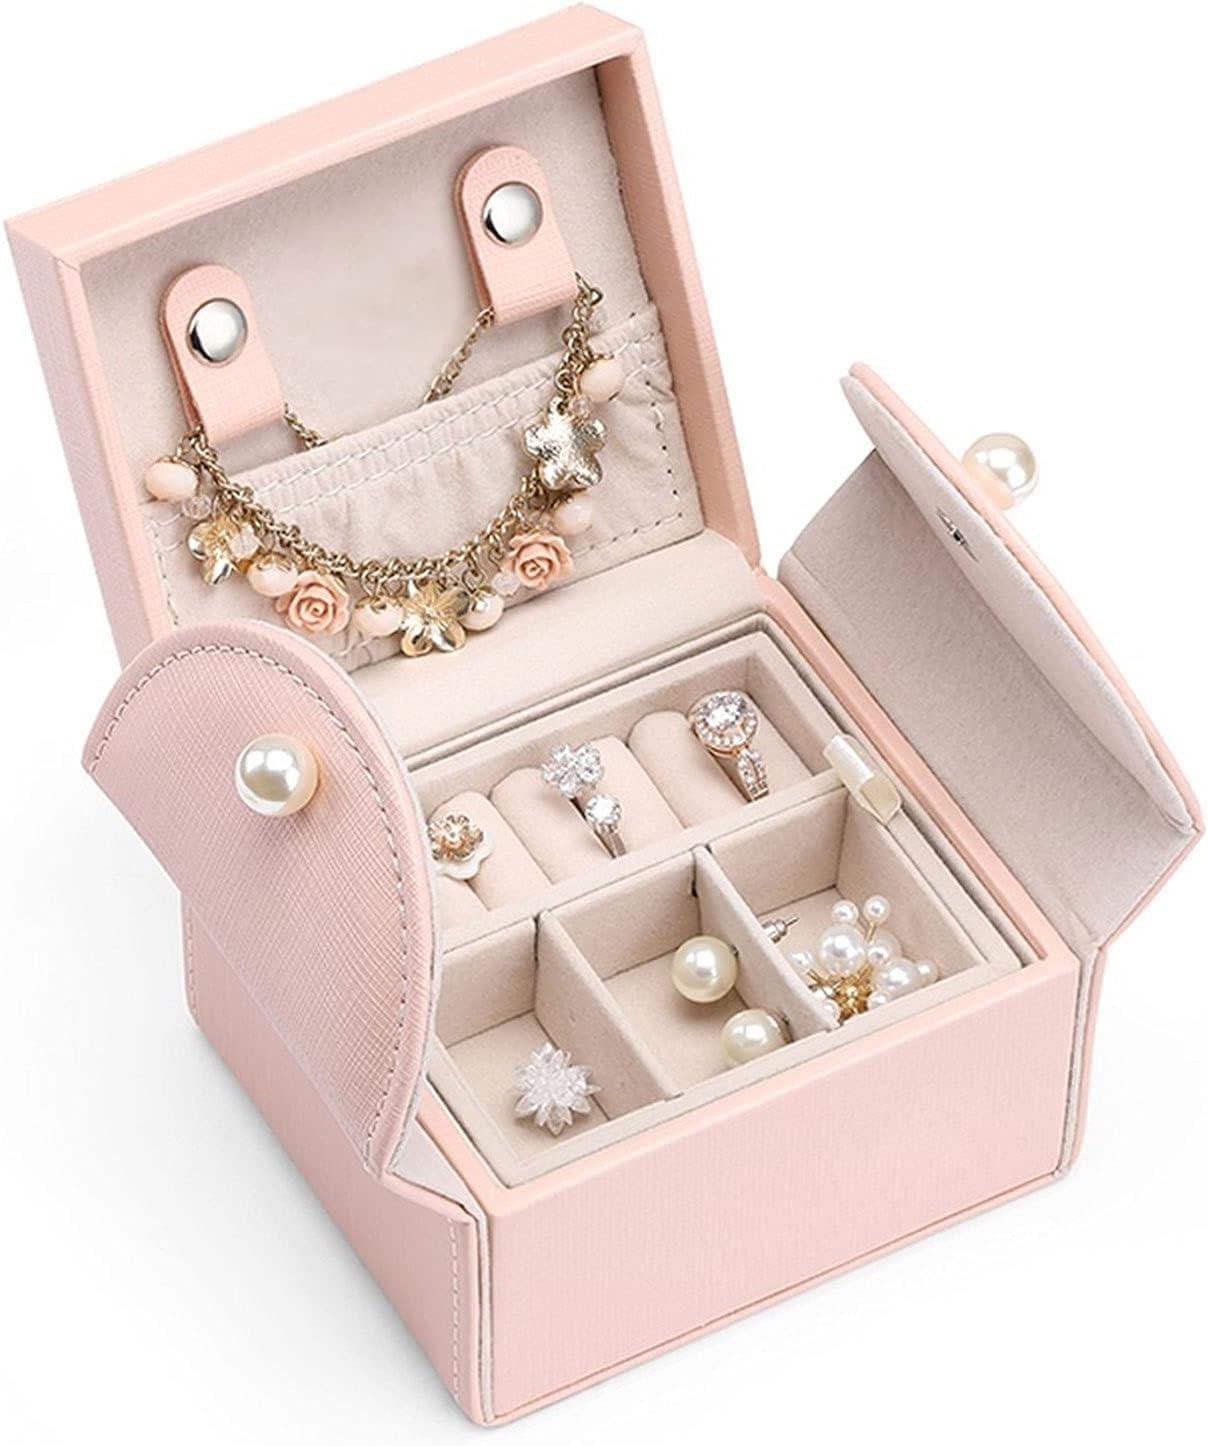 Caja Joyero Jewelry Box, Mini Soft PU Cuero Travel Caja De Almacenamiento 2 Capas Para Pulseras, Pendientes Anillos Collares Broches Regalos Para Mother Girls Mujeres (Rosa) Jewelry Organizer